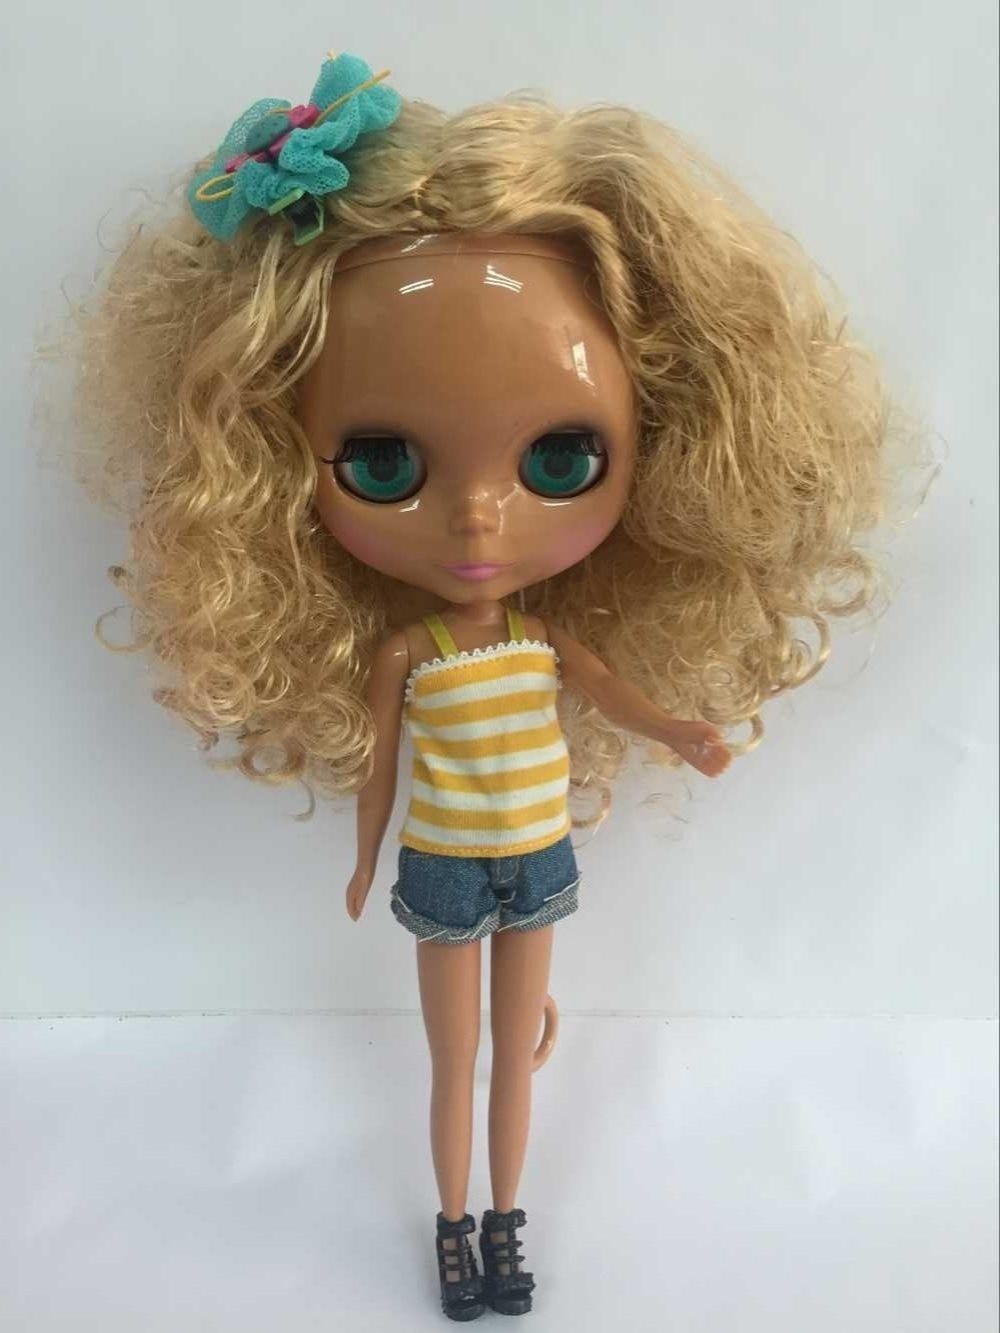 Bi 3 Blond long curly hair Nude blyth Doll black skin